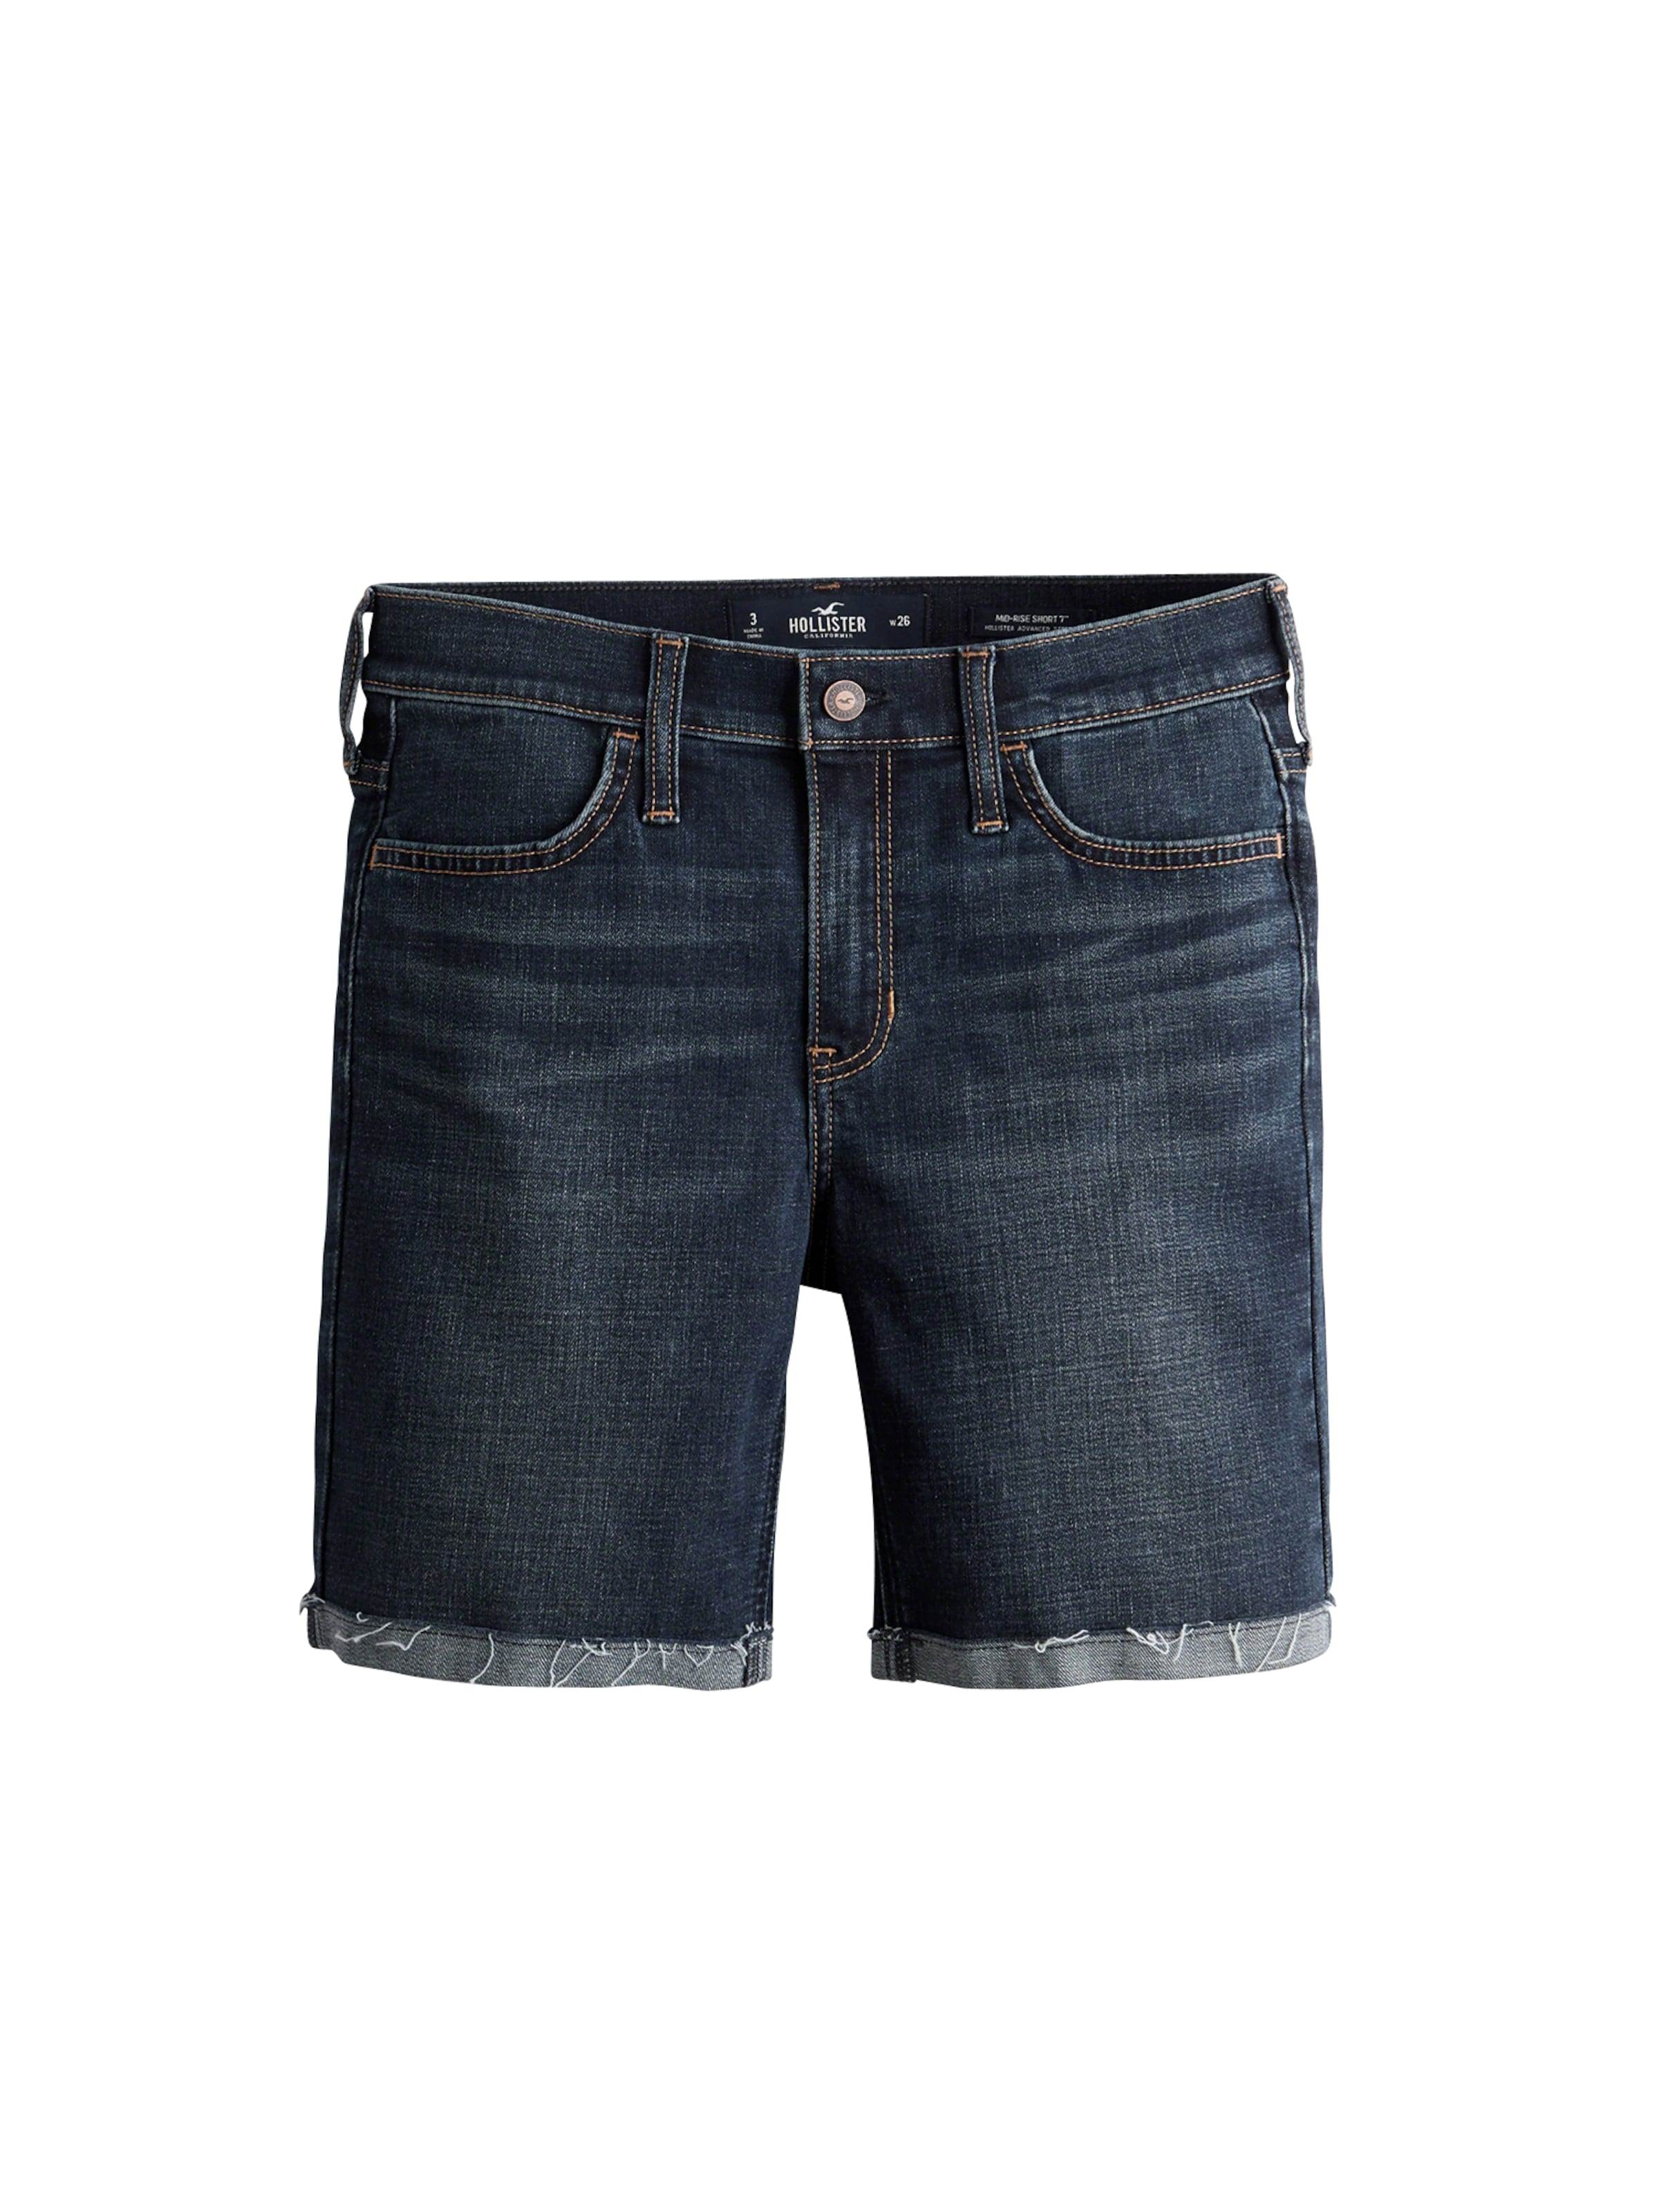 Blue Hollister As Mr 'sb19 dtc Boyshort' In Jeans Denim Y6fgyb7v